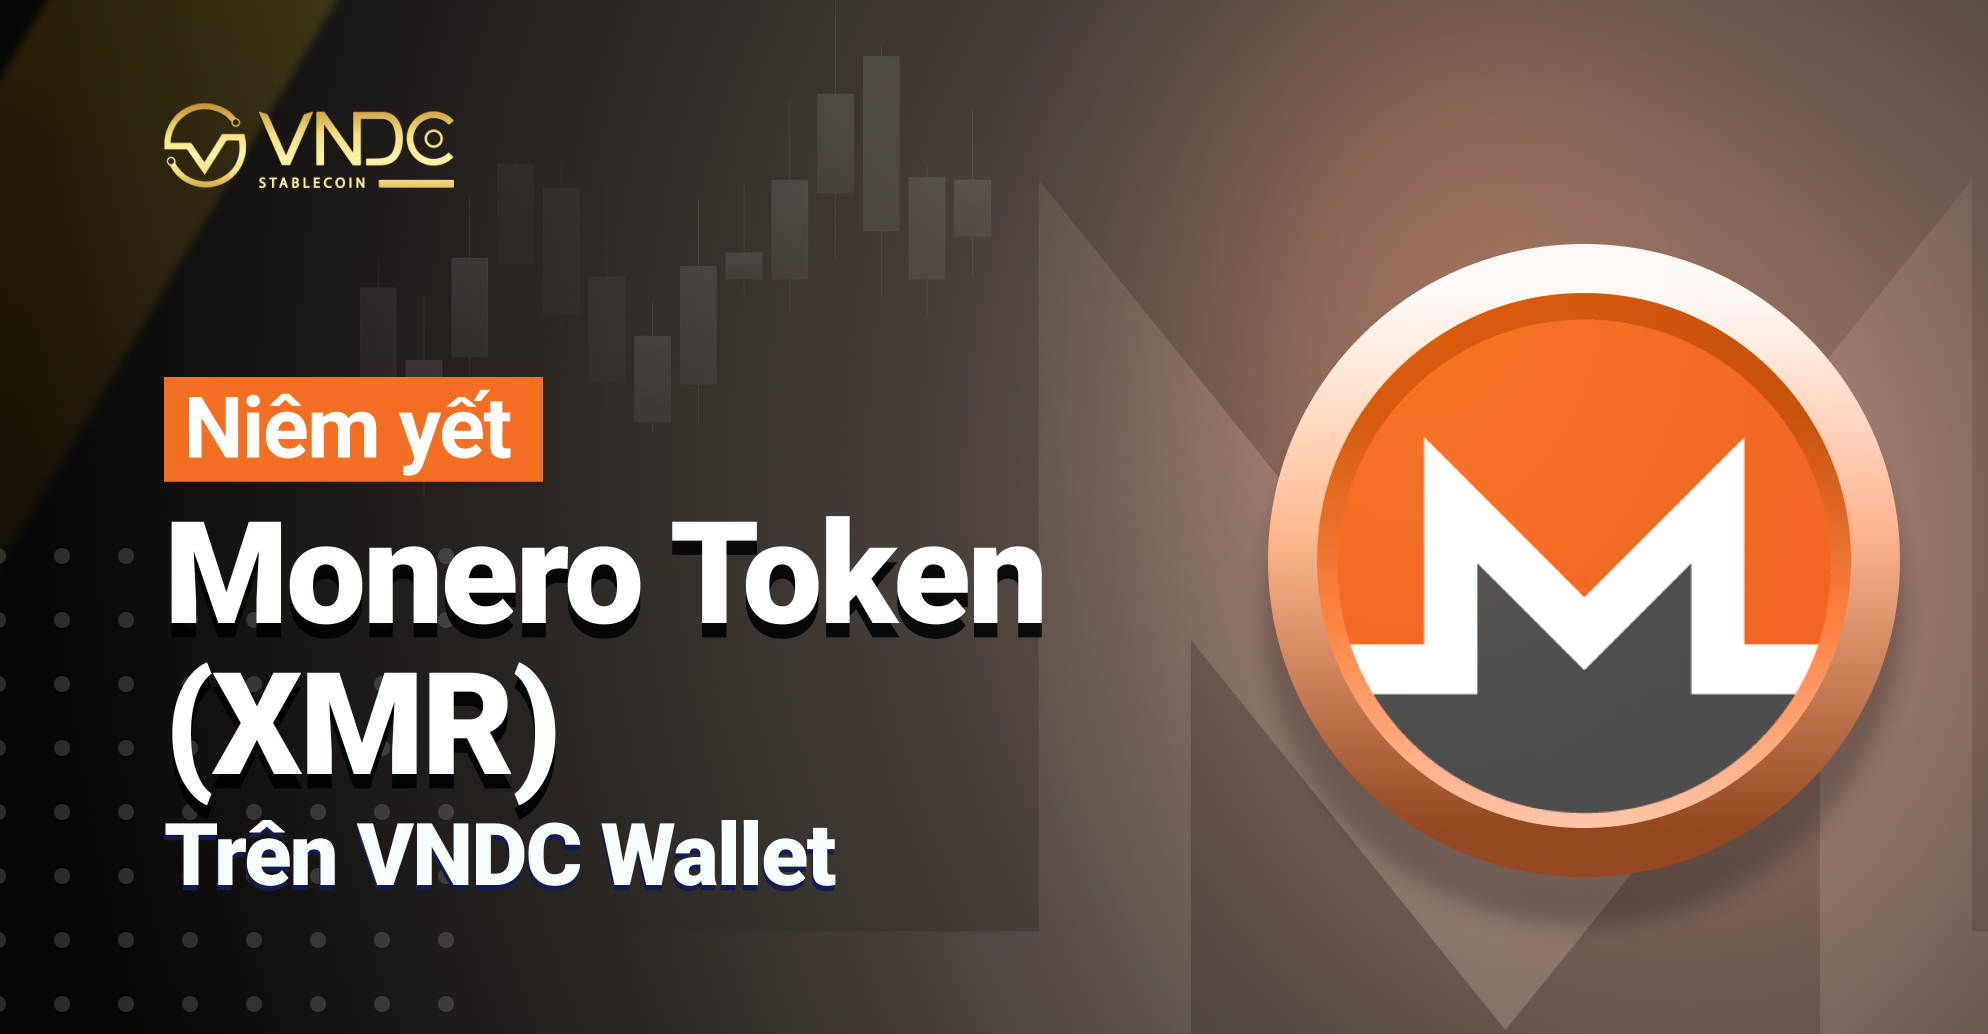 Niêm yết Monero Token (XMR) trên VNDC Wallet